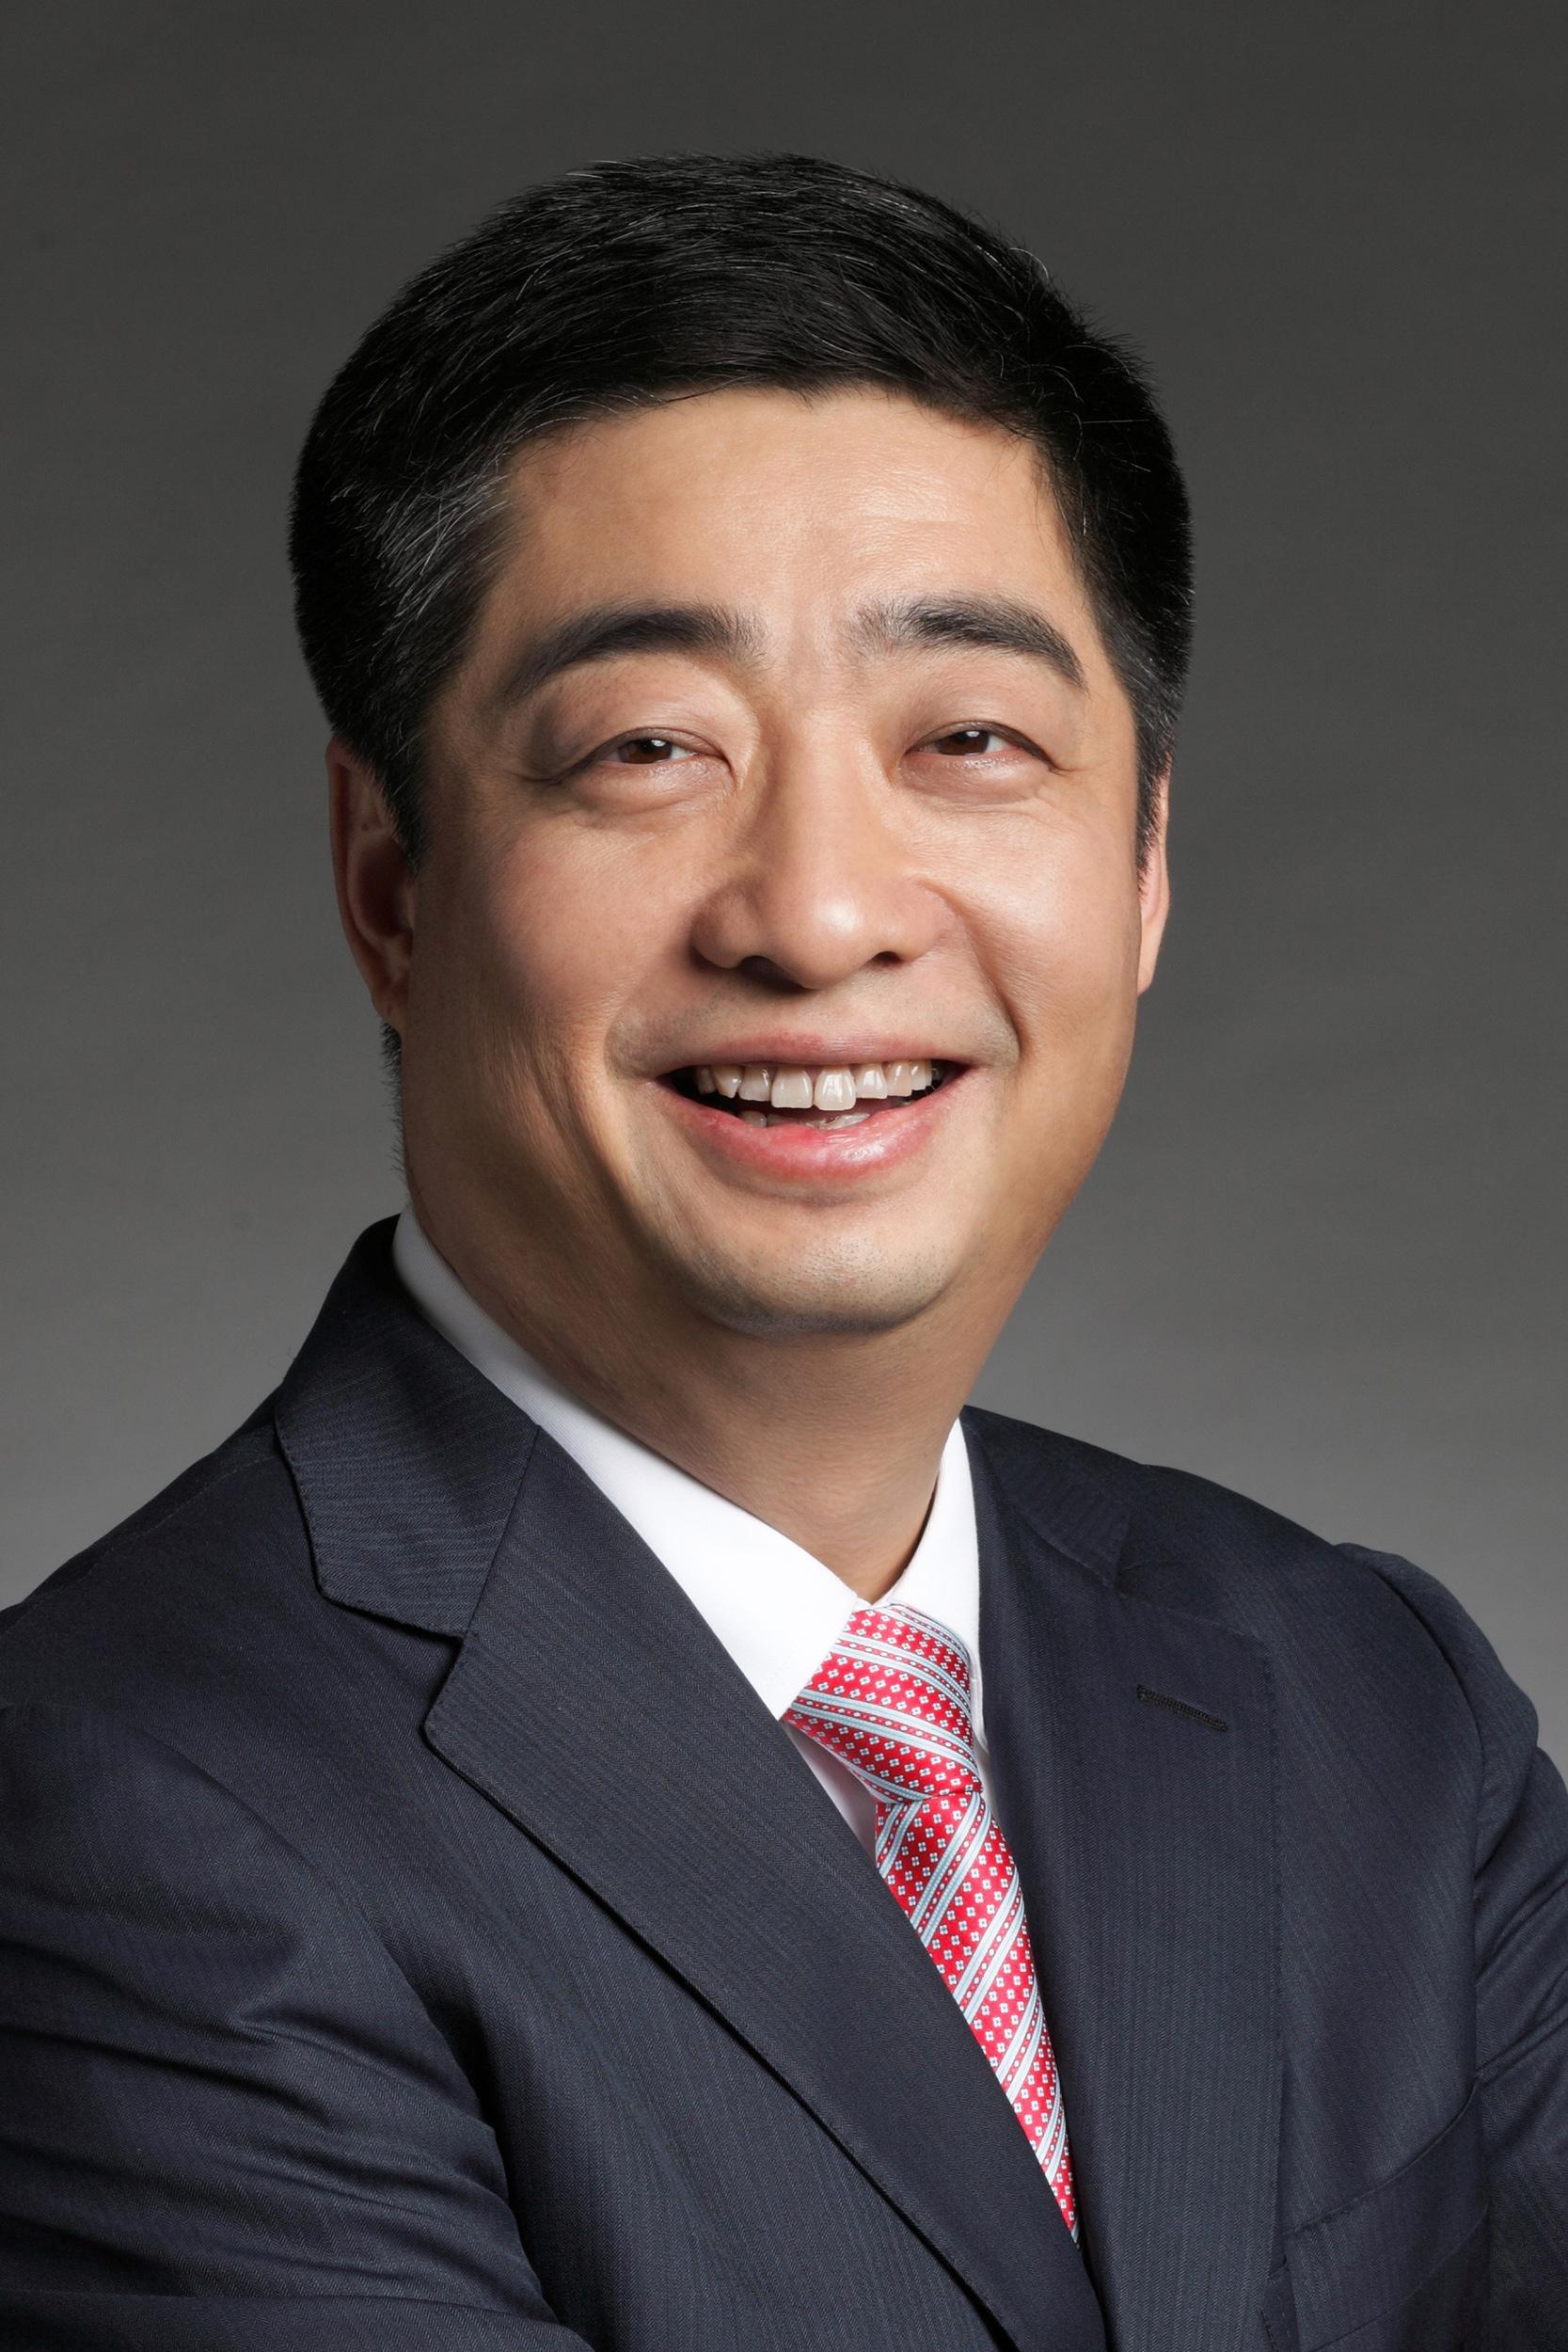 Ken Hu, VP y Presidente Rotativo de Huawei.